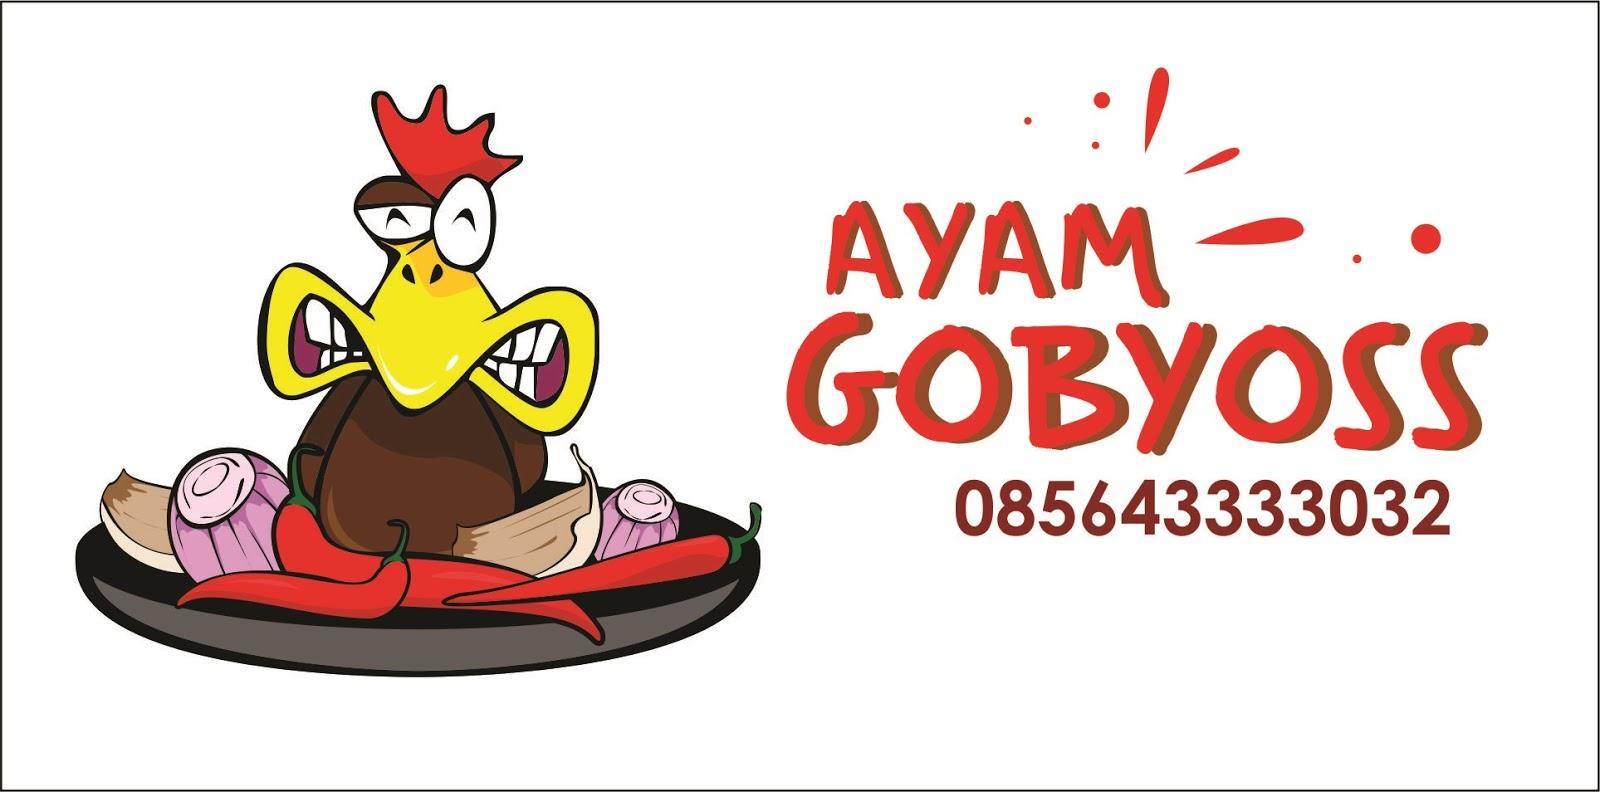 Lowongan Lulusan Smp Di Yogyakarta Kru Outlet Dan Kasir Ayam